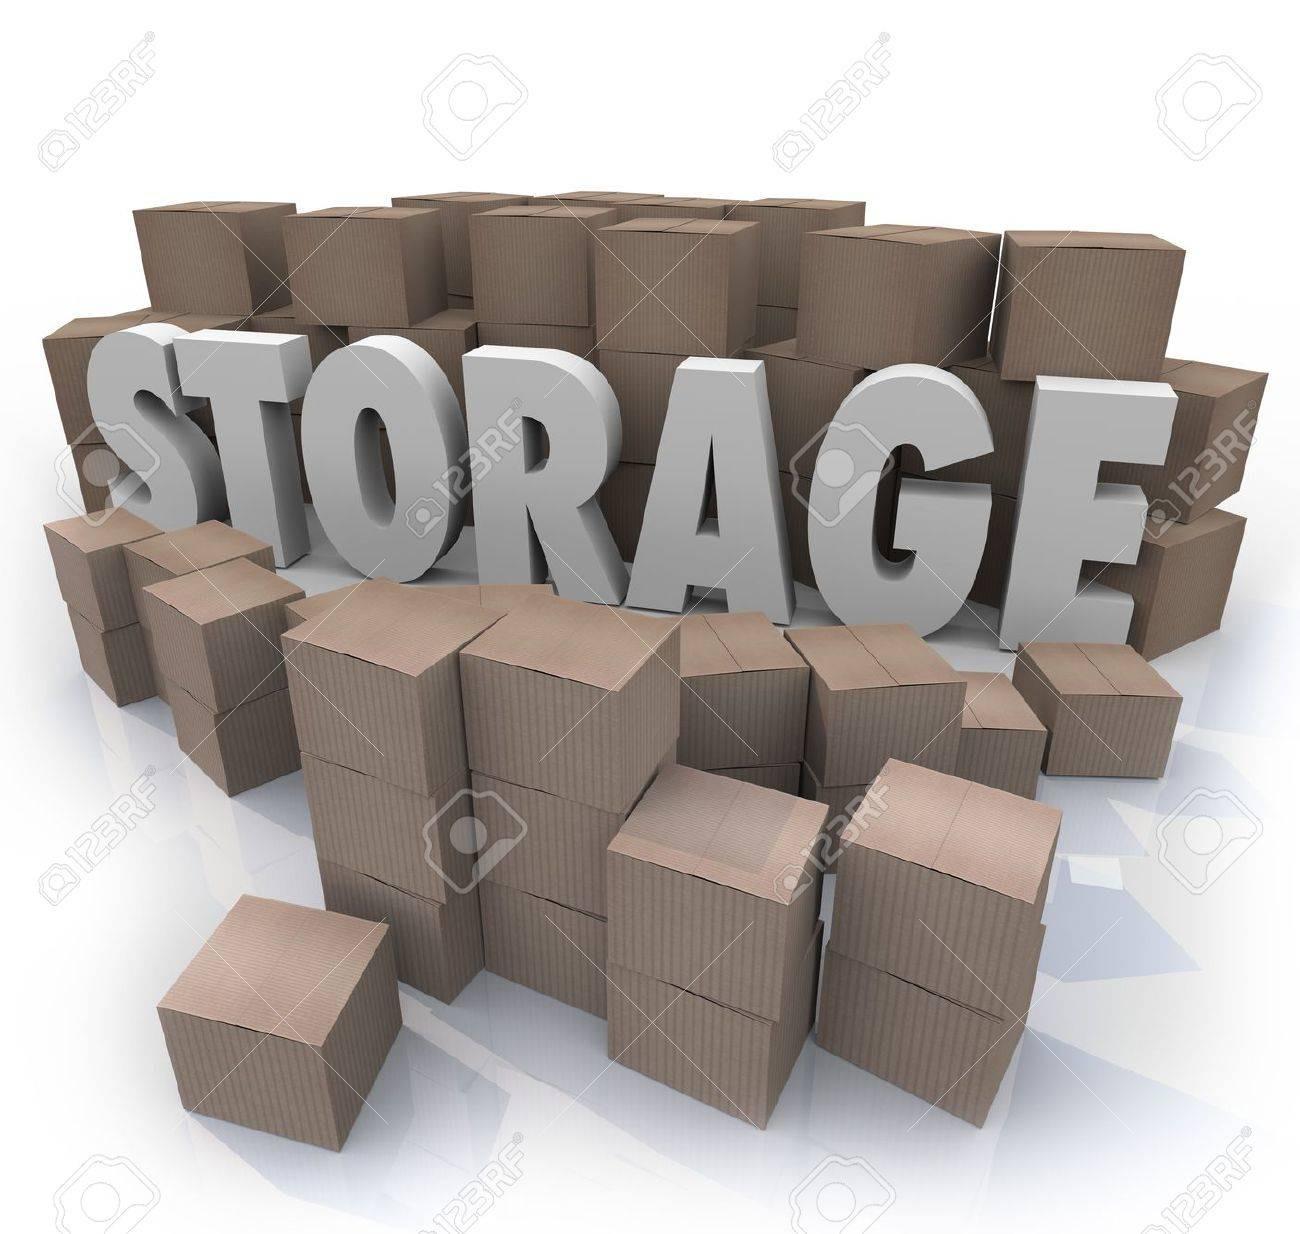 7x10 Basement self storage unit